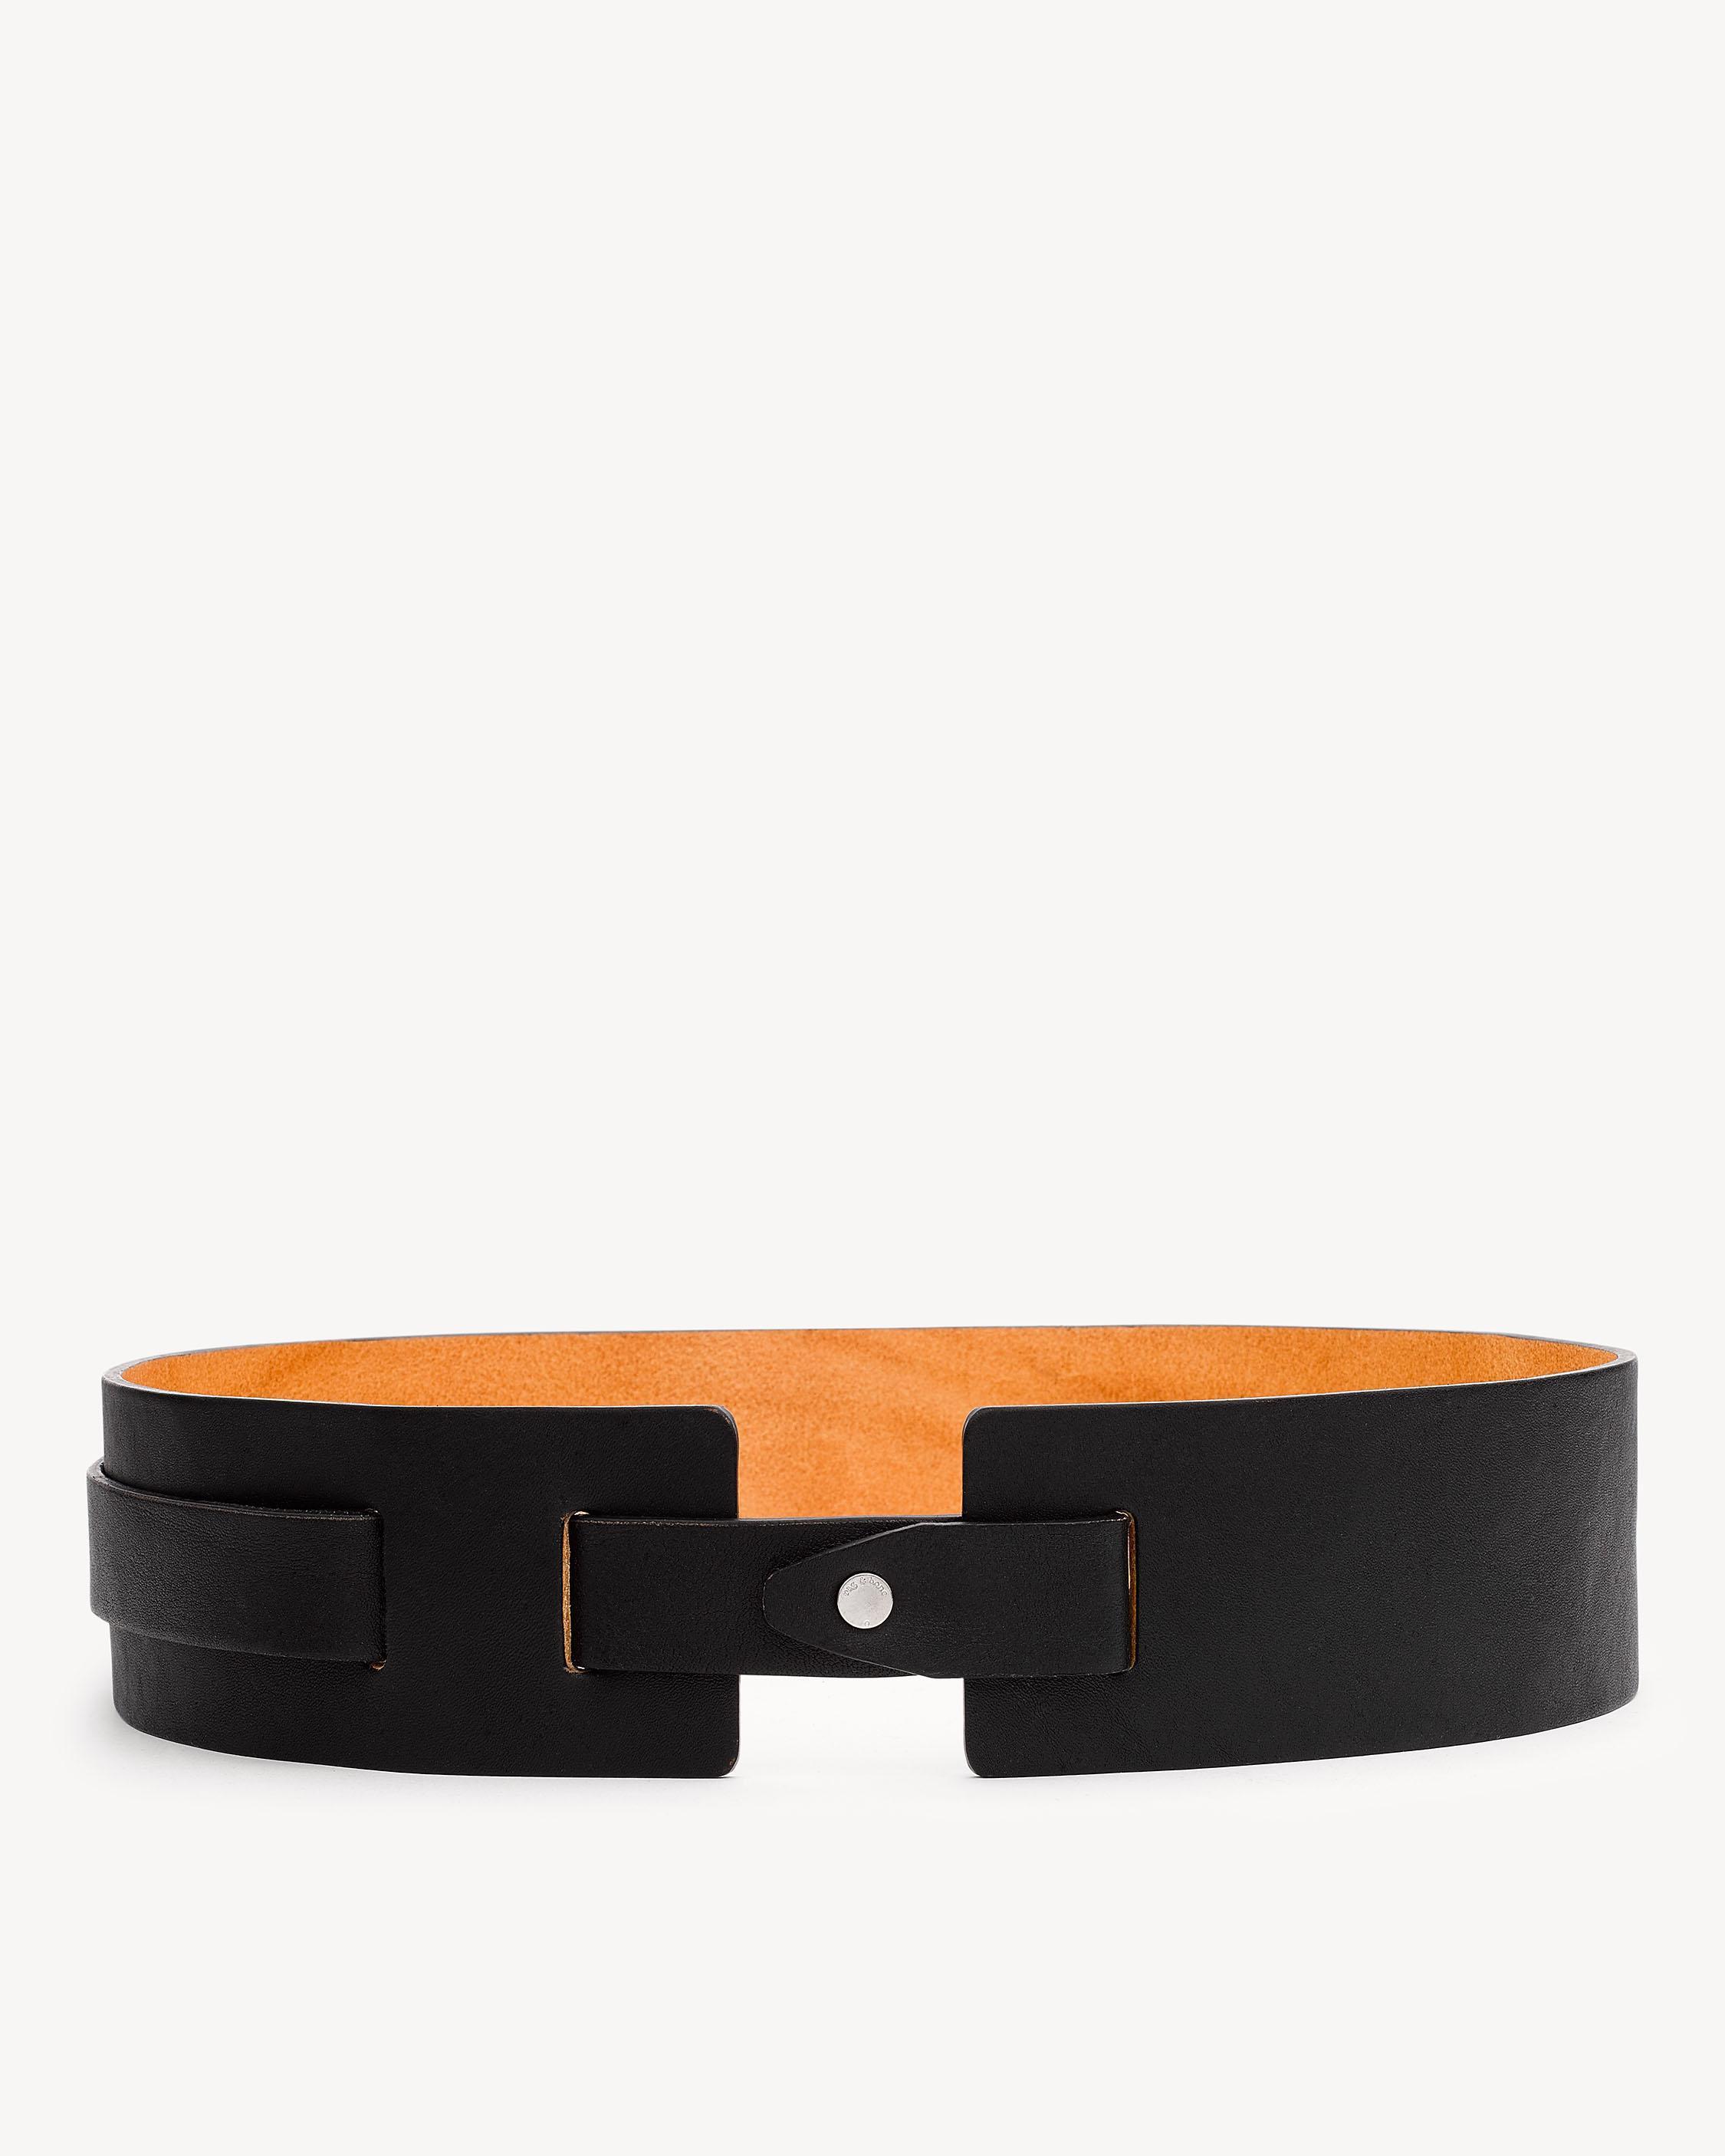 Small Leather Goods - Belts Virreina sMORPt7Cb6